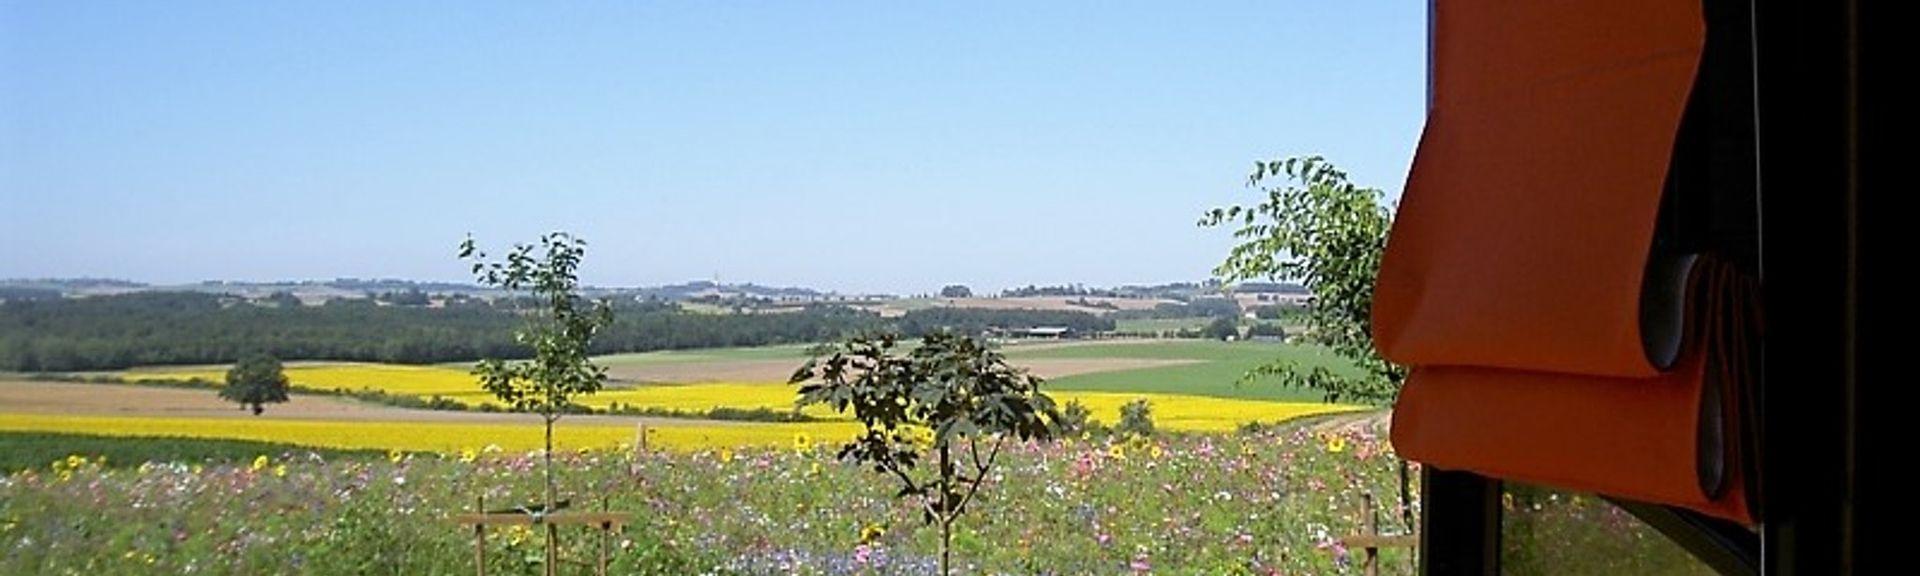 Mauroux, Bastides de Lomagne, Occitanie, Frankrijk